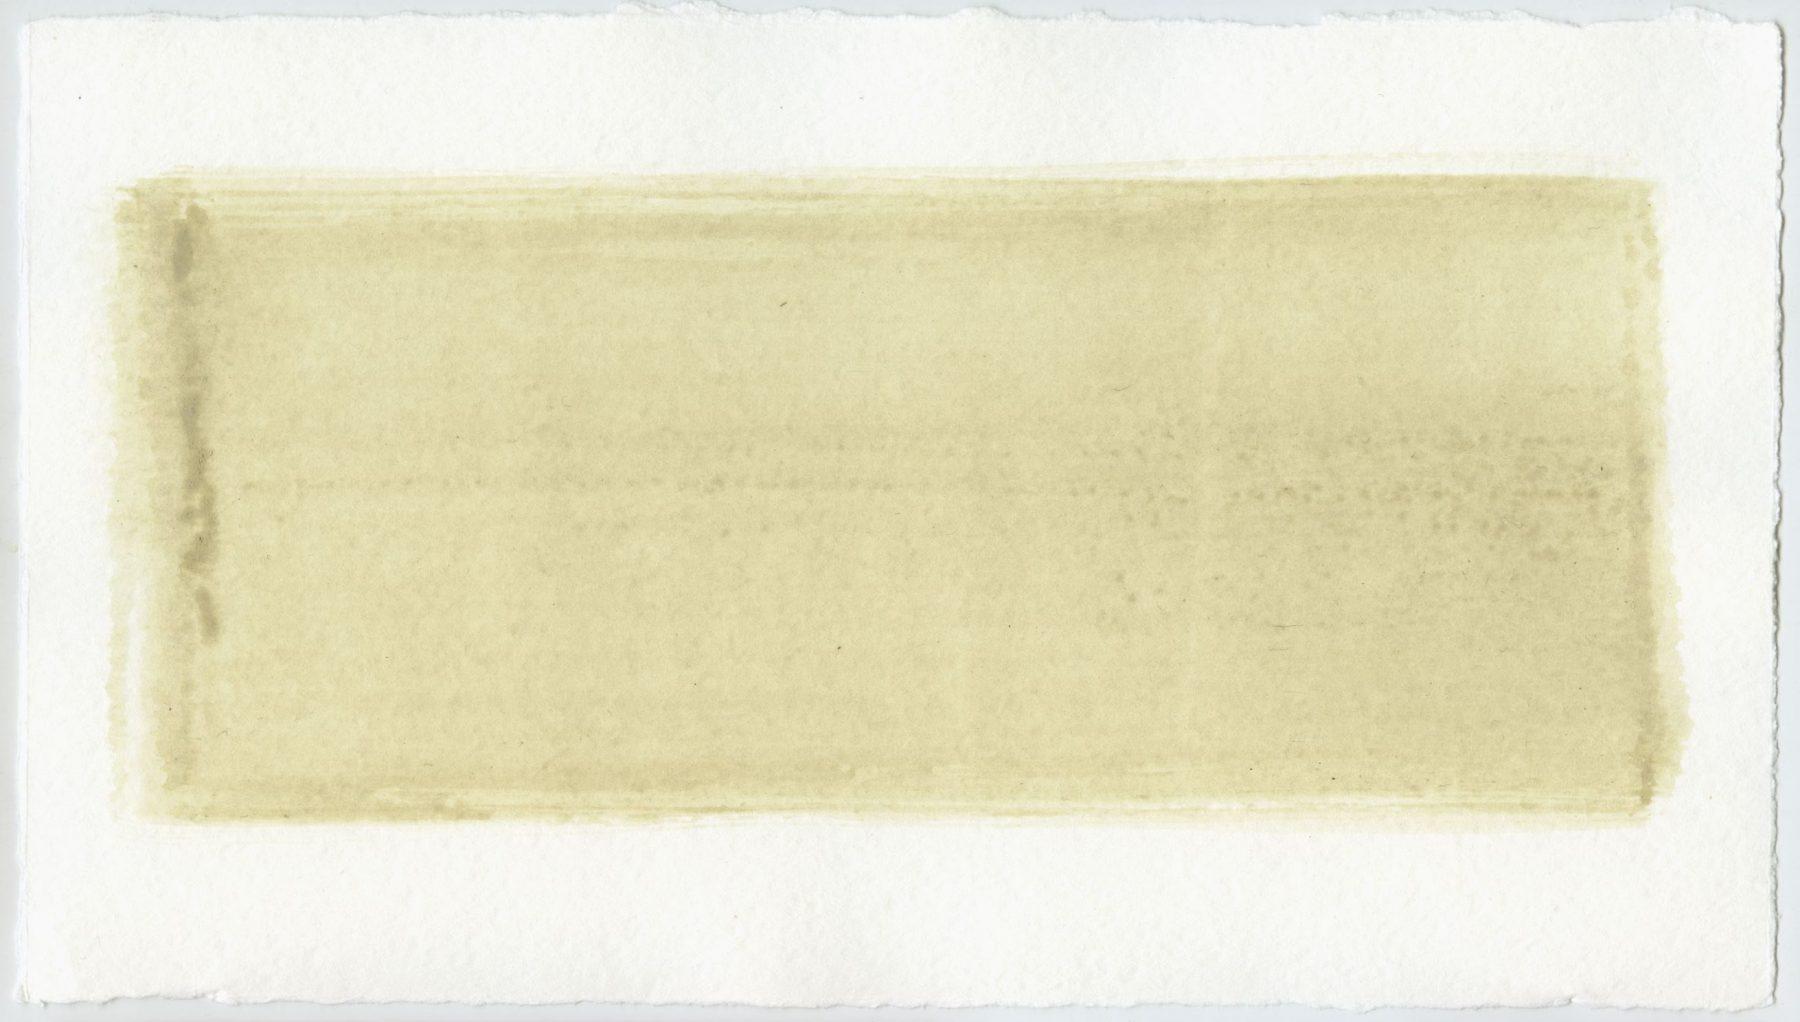 Brush stroke no. 8 - Selfmade pigment: Slabroek grijs